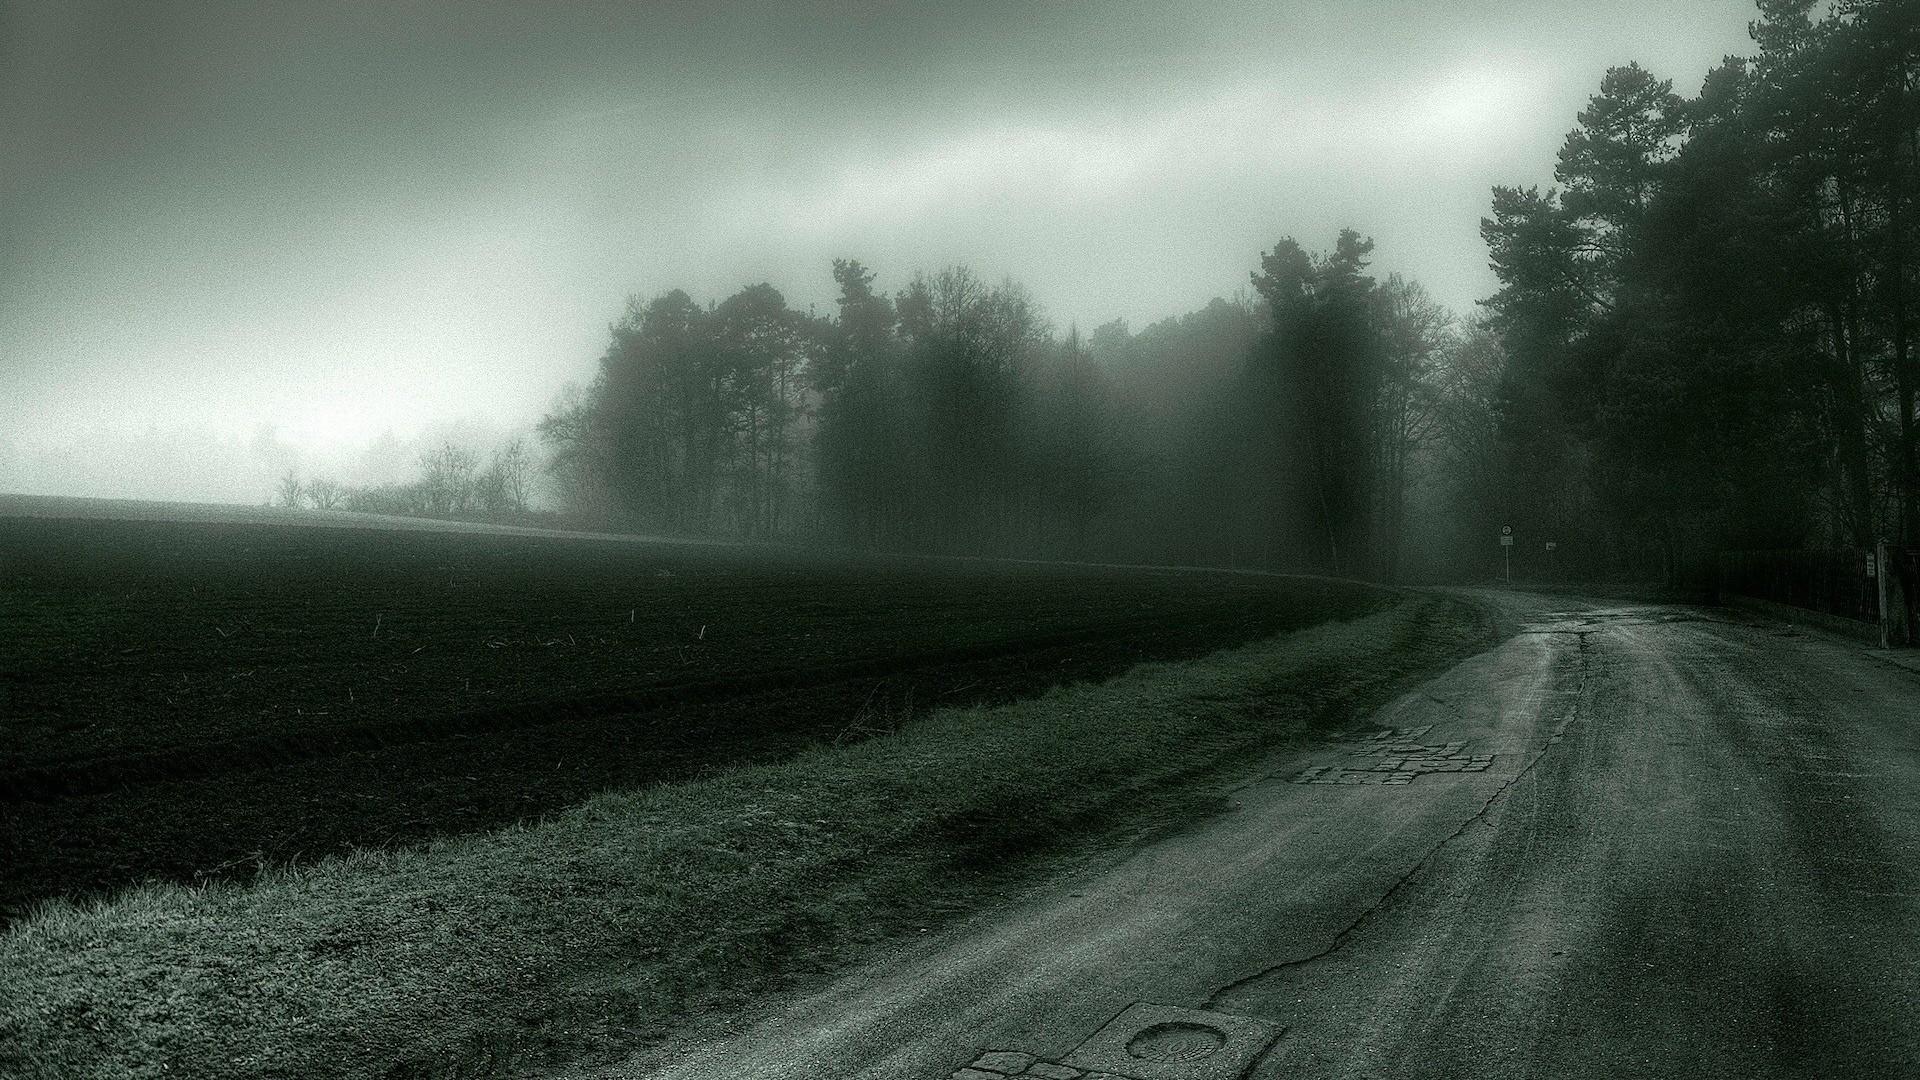 Gloomy HD Wallpaper